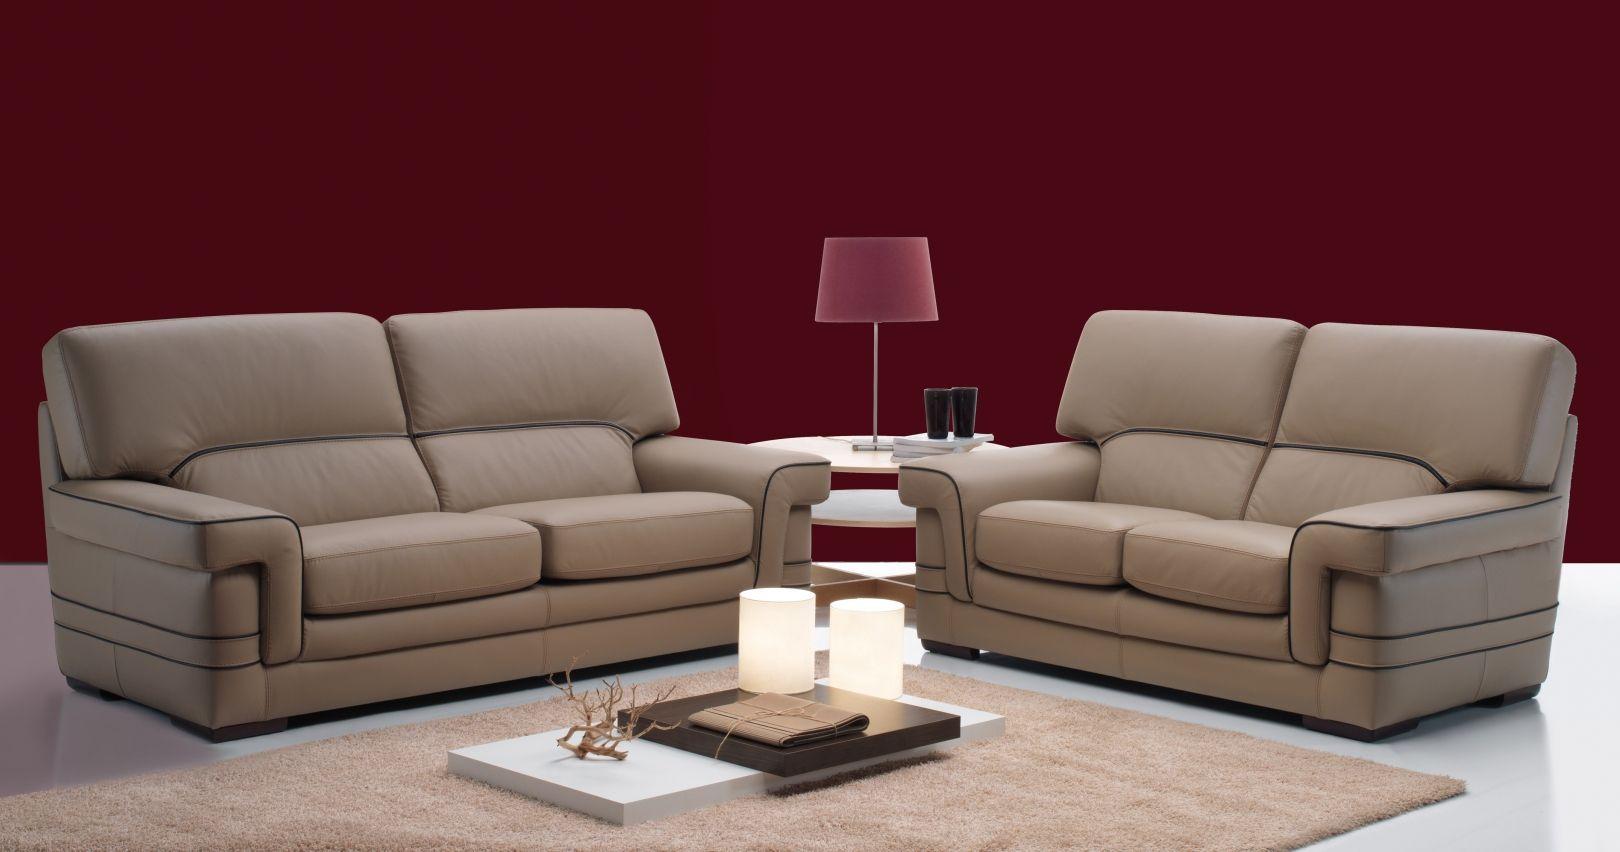 Modele De Salon En Cuire | Home decor, Sofa, House design